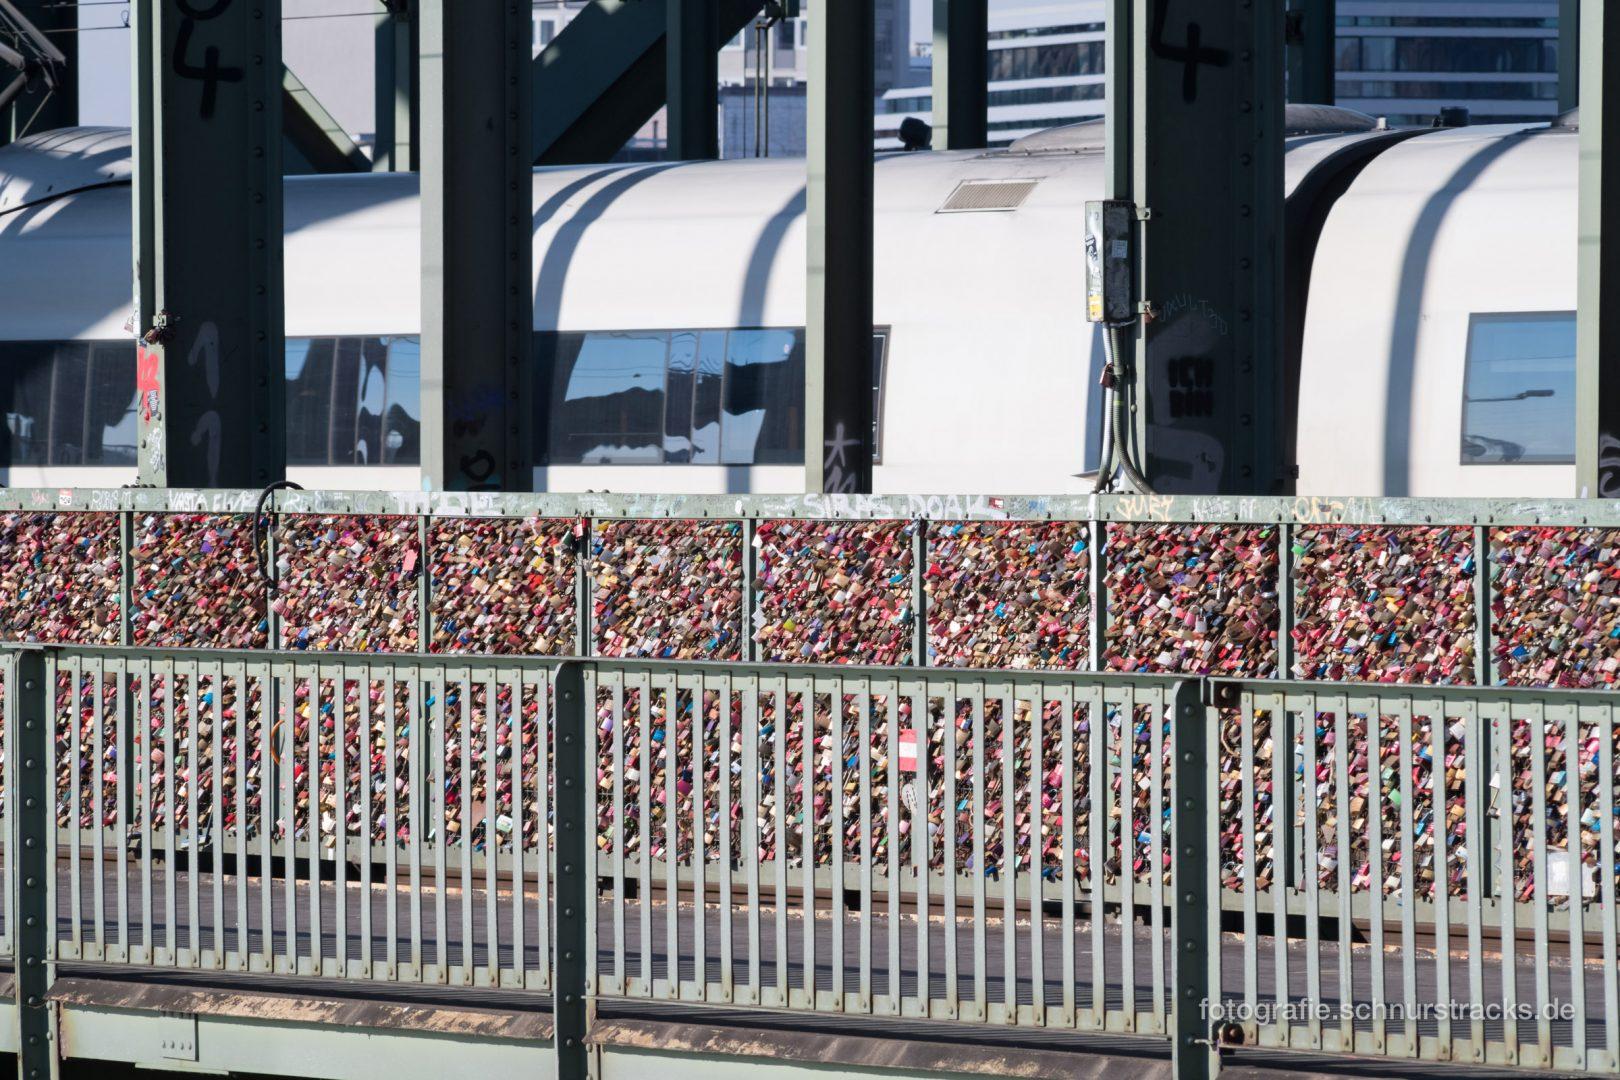 Liebesschlösser Hohenzollernbrücke #1161